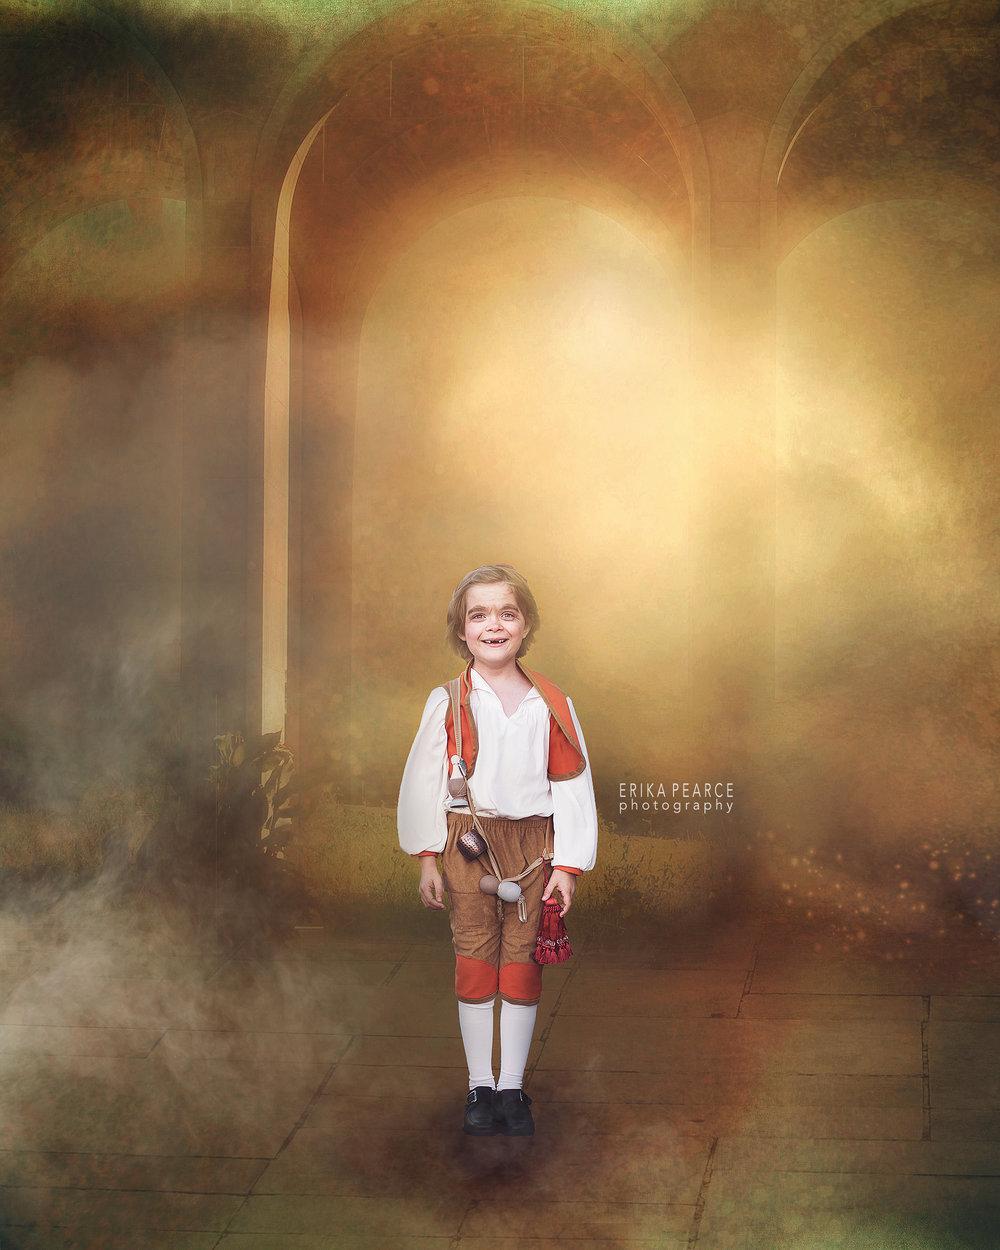 Halloween Labyrinth Jareth David Bowie Ludo Sarah Ball gown covington la mandeville la new orleans NOLA hoggle